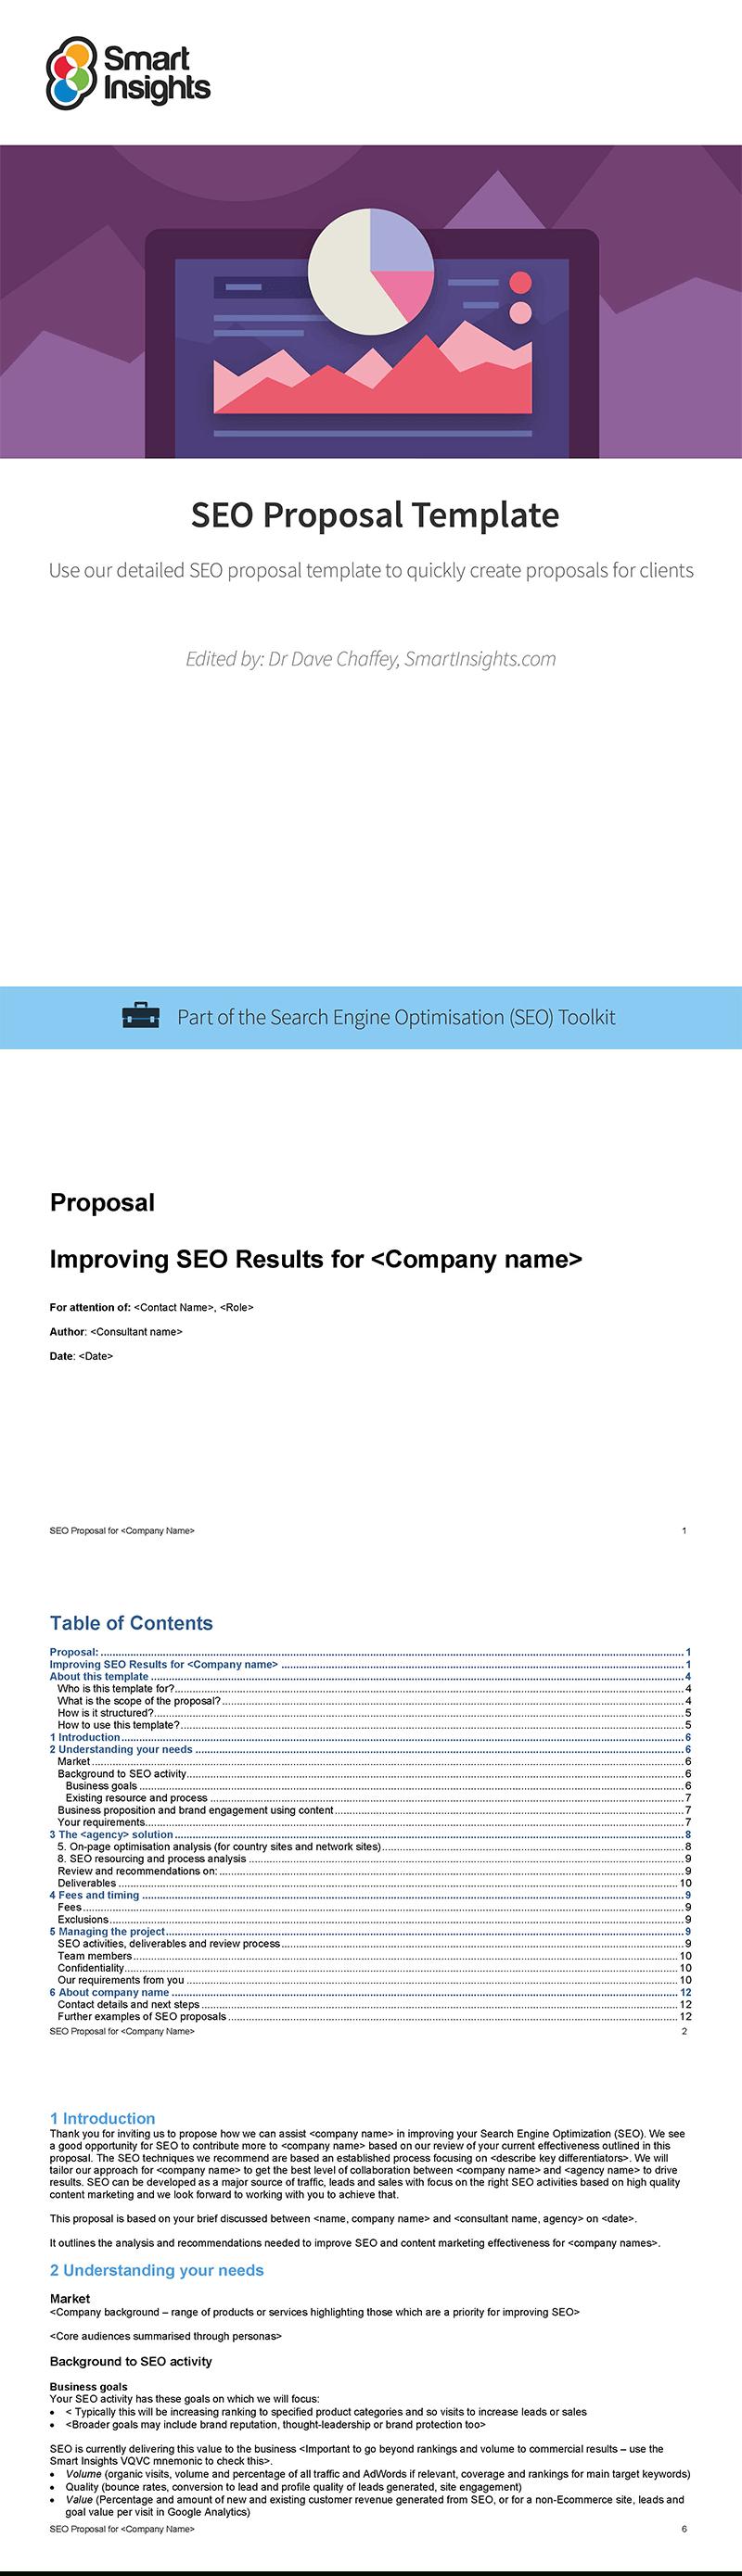 Seo Proposal Template  Smart Insights Throughout Seo Proposal Template